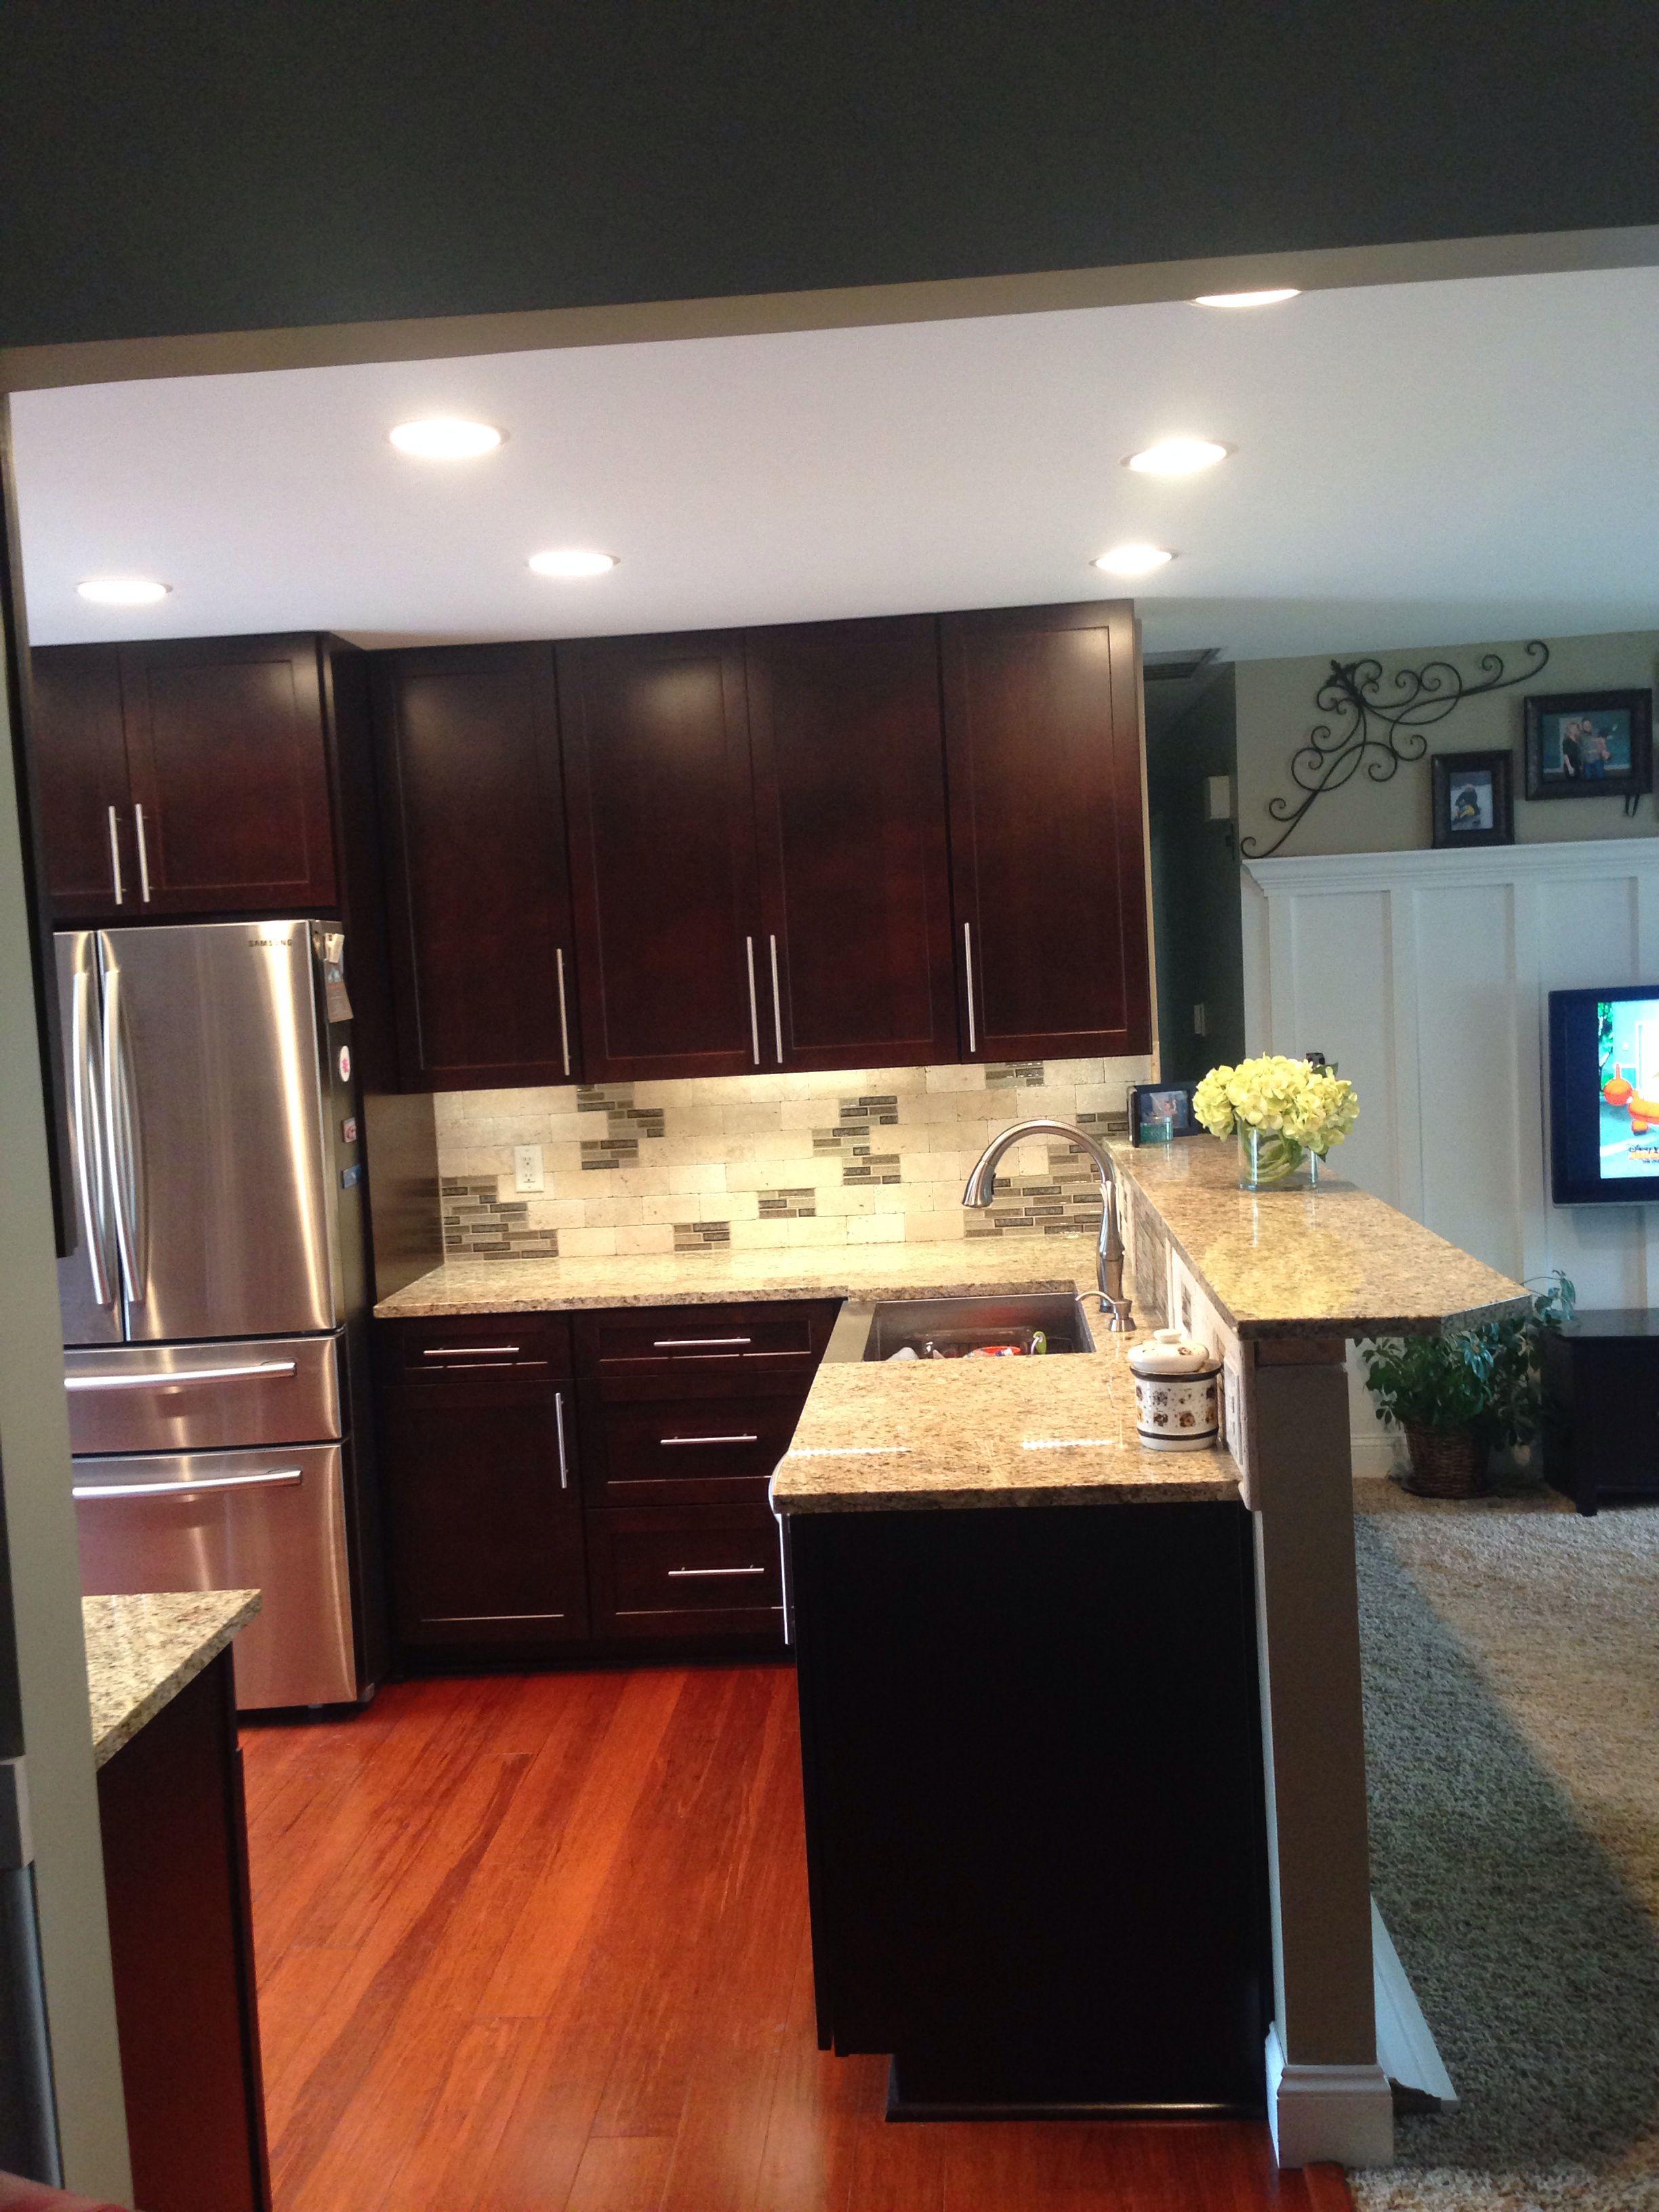 shenandoah cabinets style breckinridge in cherry java housestuff kitchen interior kitchen on kitchen cabinets java id=23169